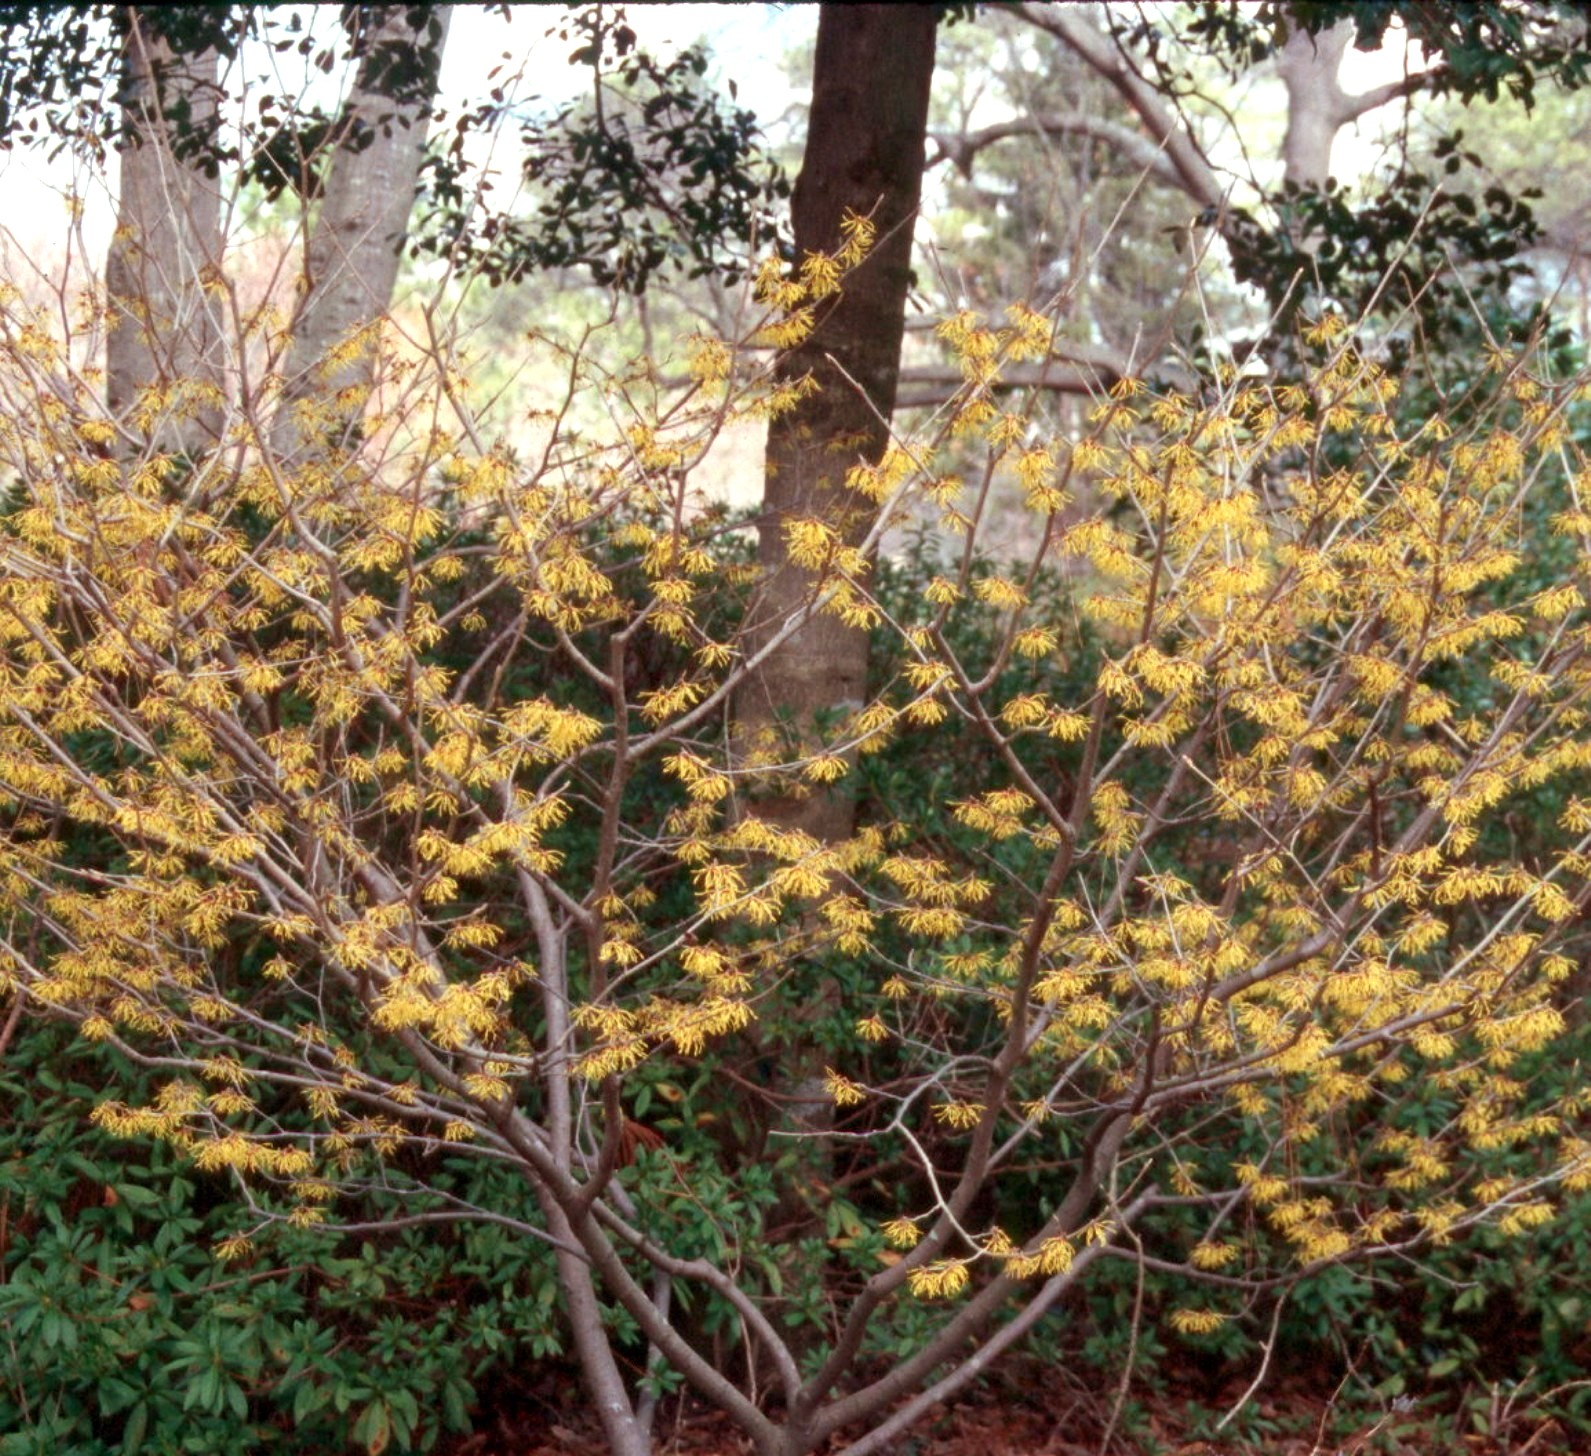 American witch-hazel in bloom in fall, yellow flowers.